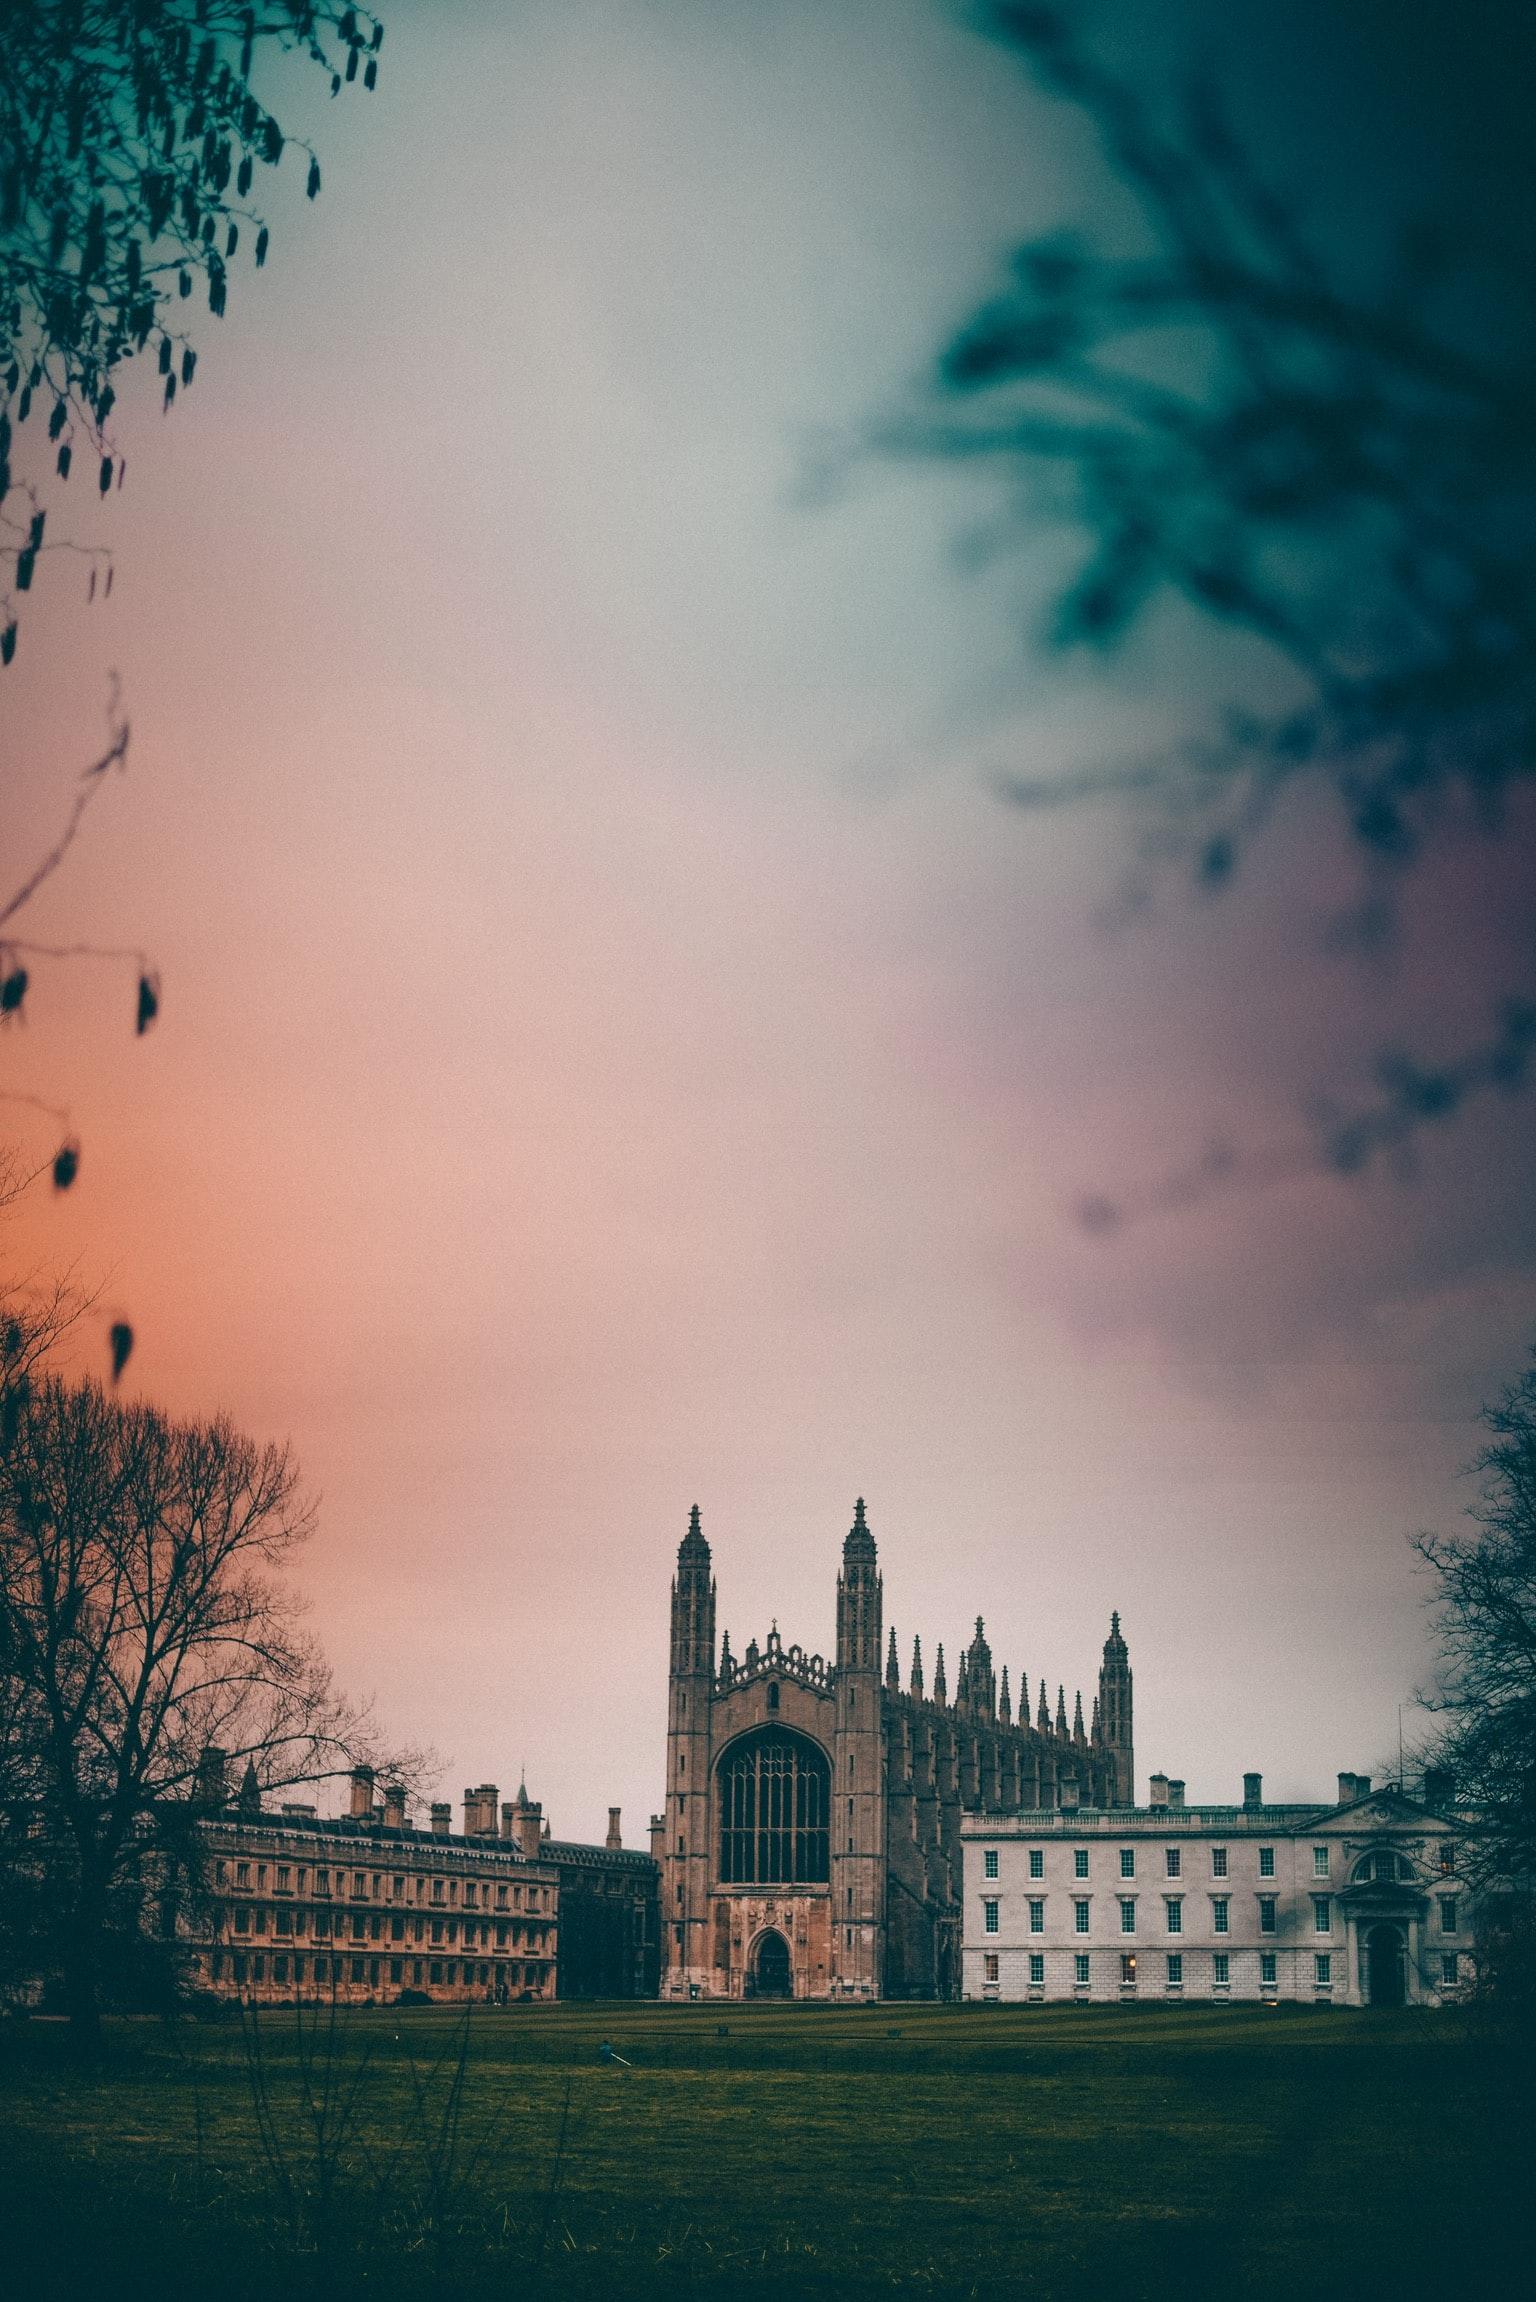 Cambridge follow-up